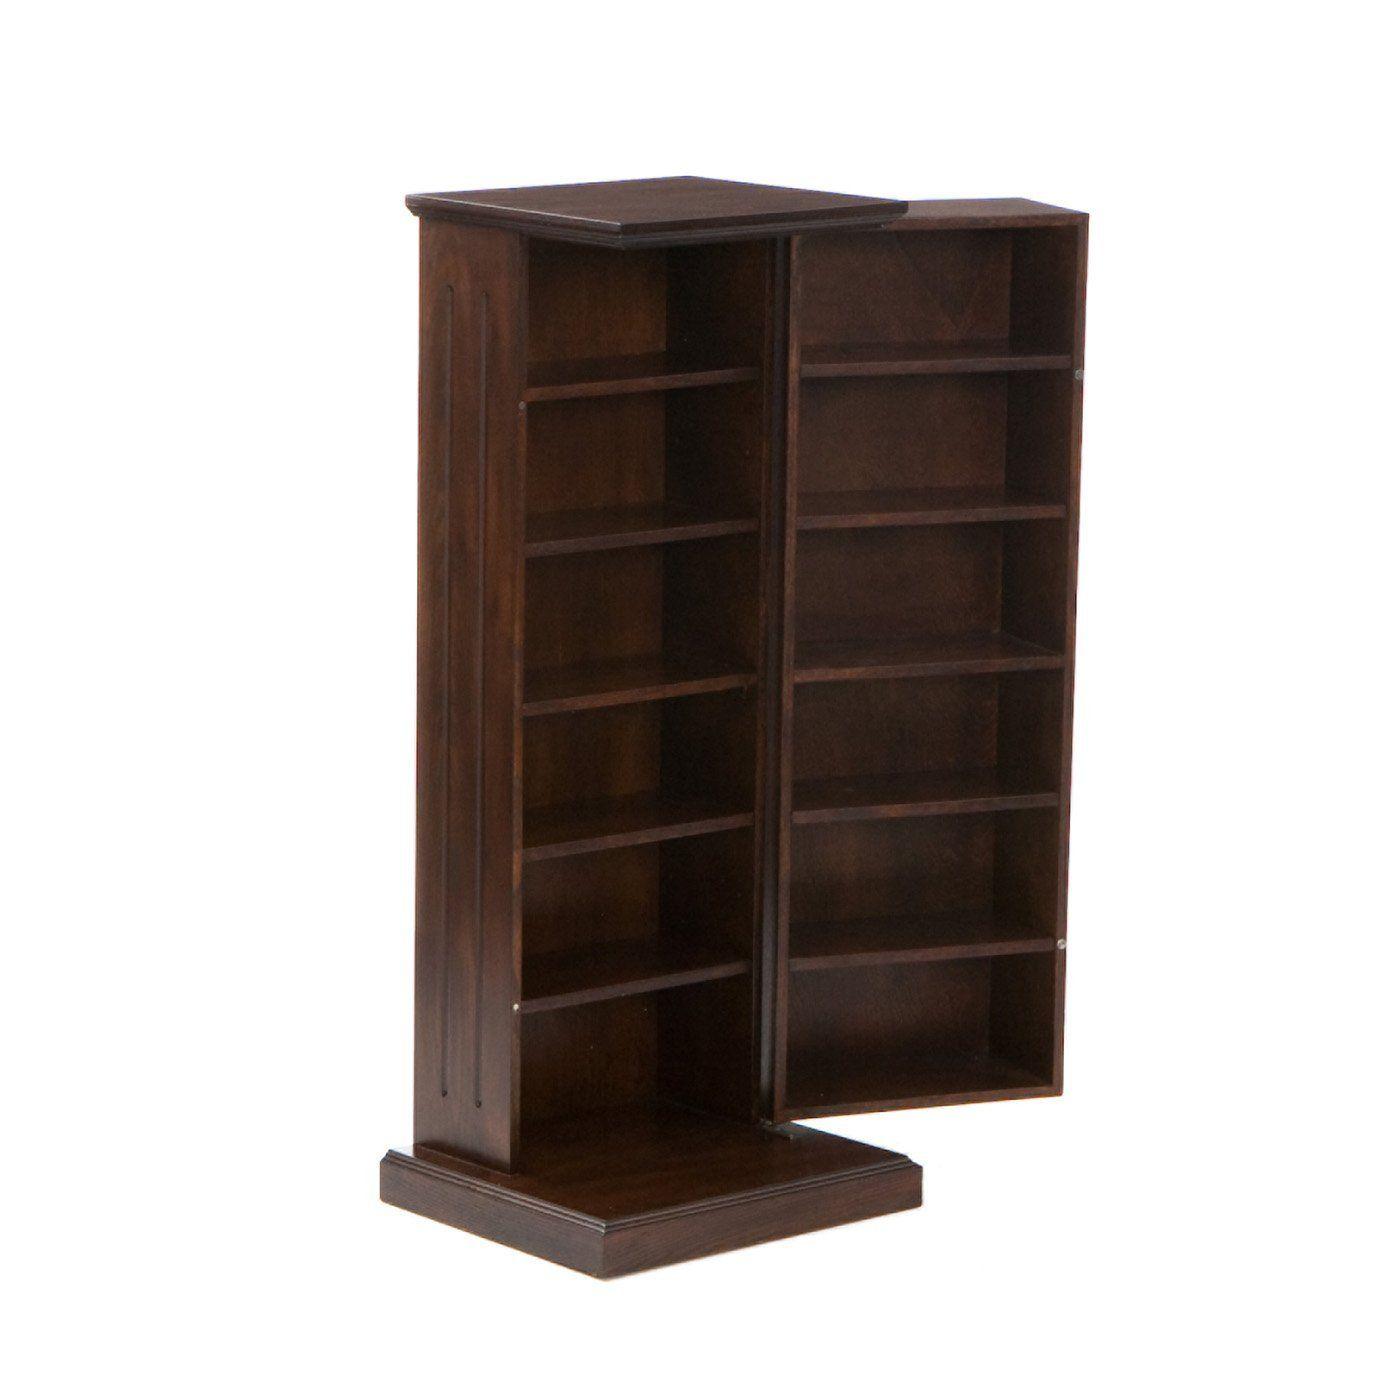 Media Storage Pedestal In Espresso Southern Enterprises Ms9213r